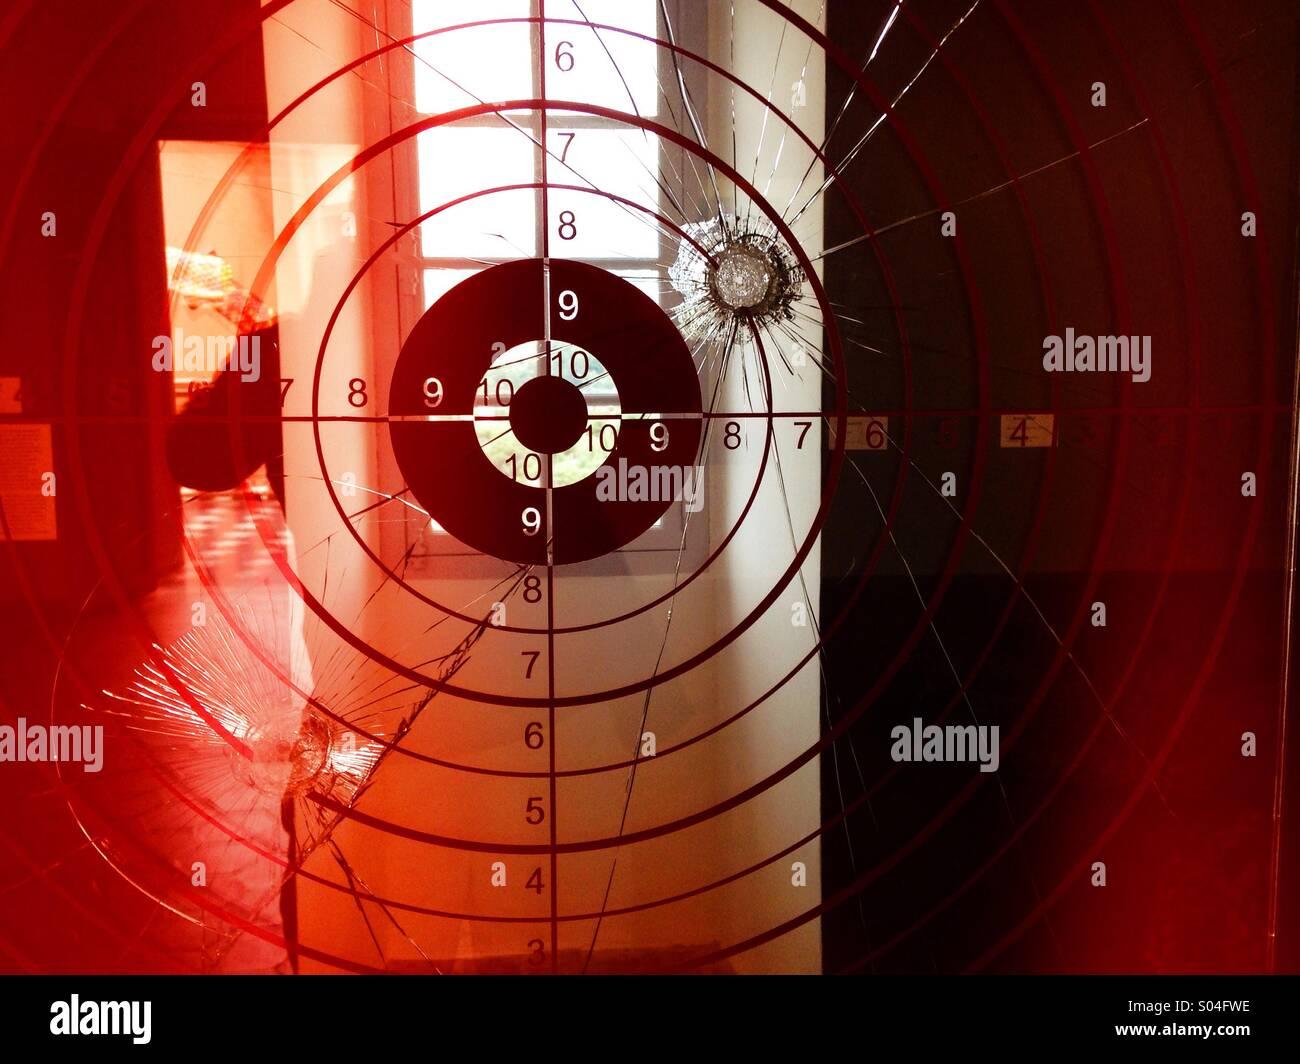 Bullseye and bullet hole - Stock Image